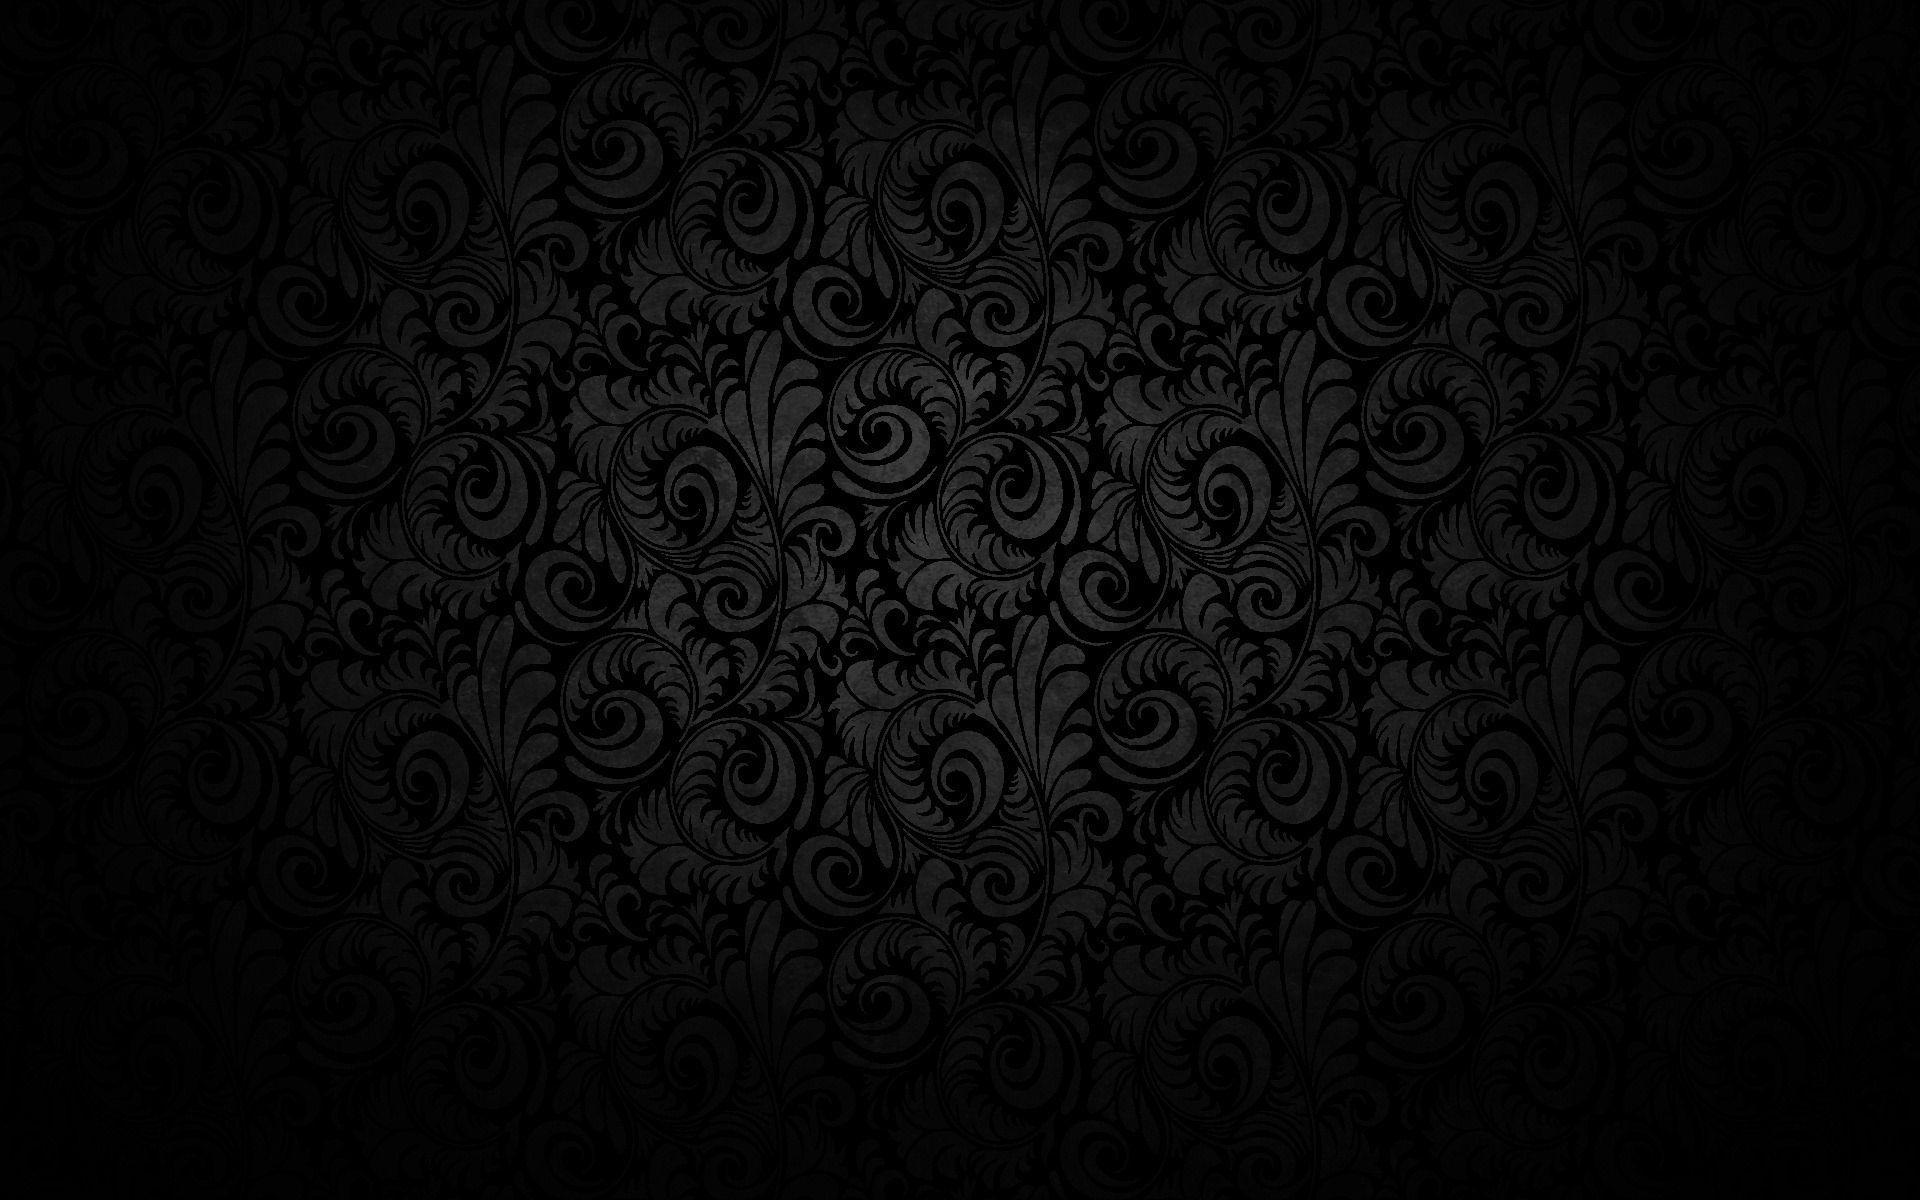 Black Abstract Wallpapers 1080p Monodomo 4k Wallpapers For Pc Dark Blue Wallpaper Black And Blue Wallpaper